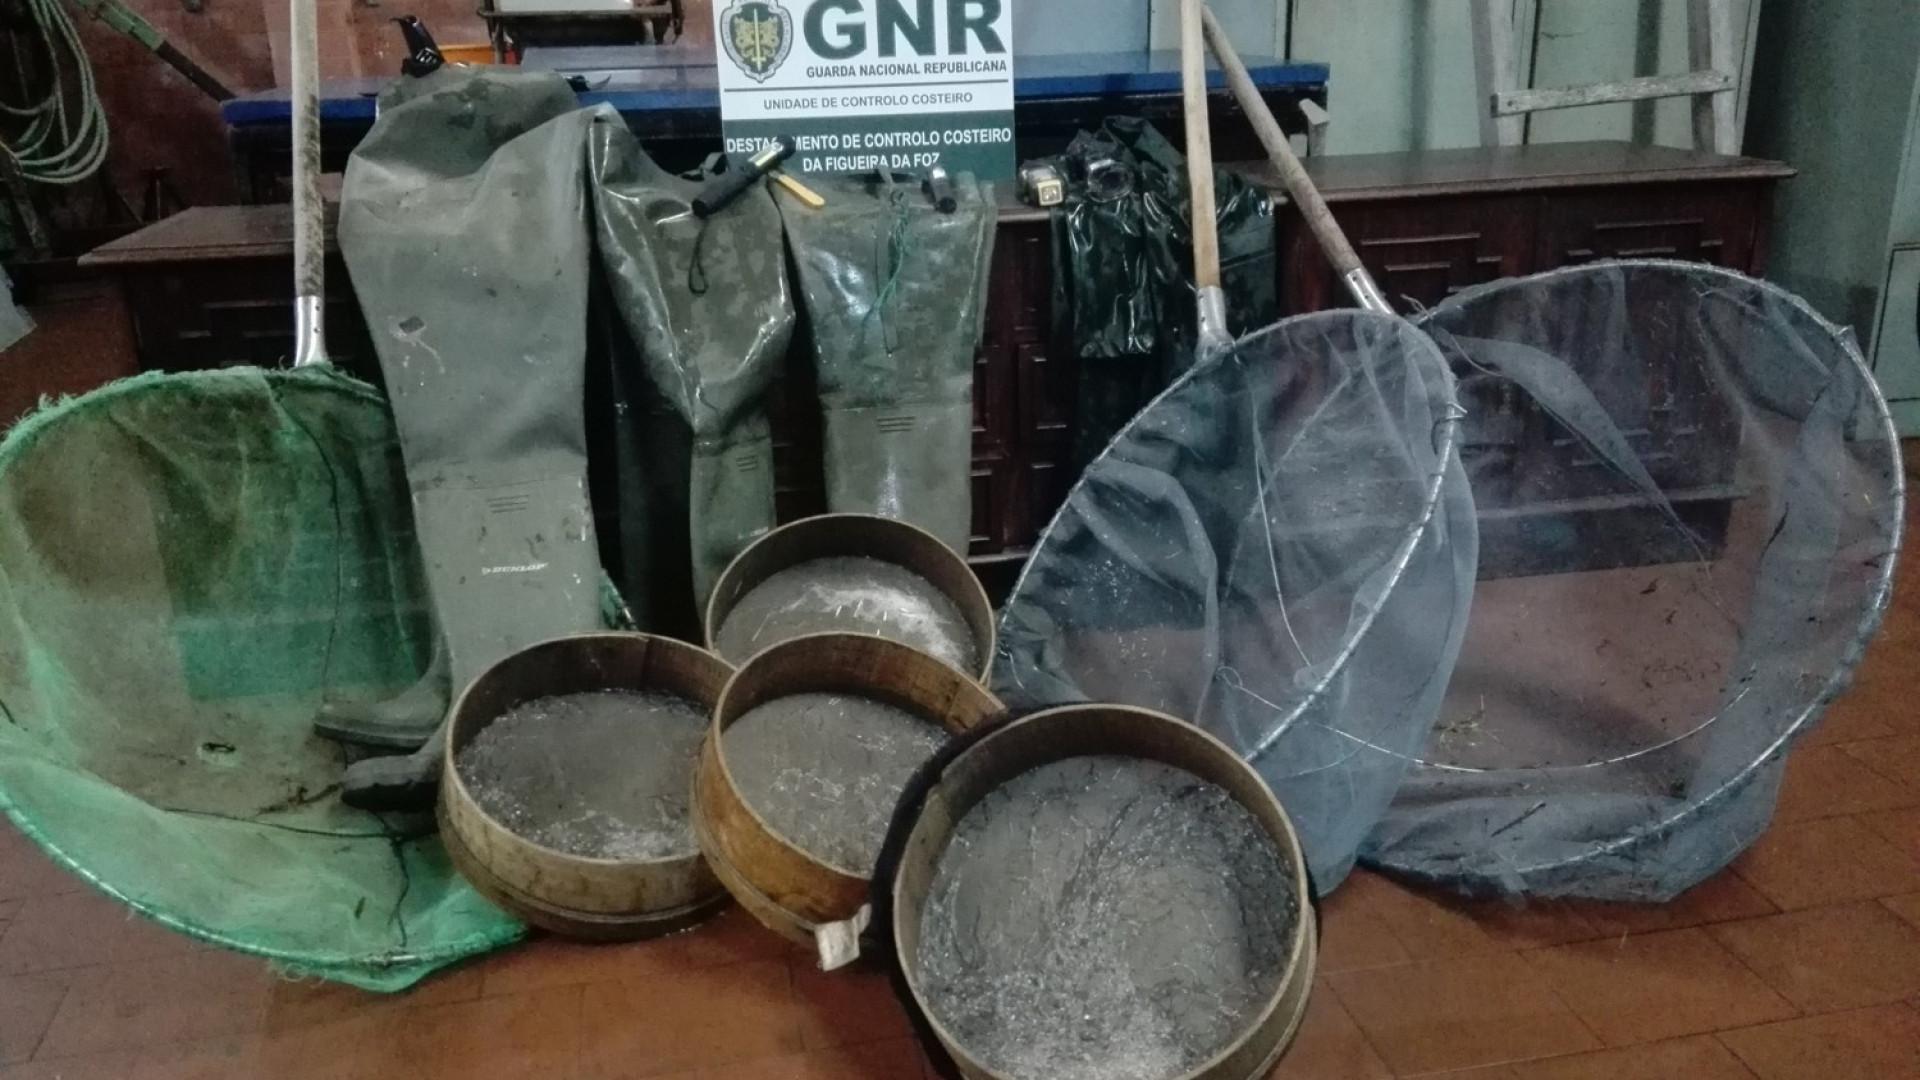 Quatro quilos de meixão apreendidos em Estarreja